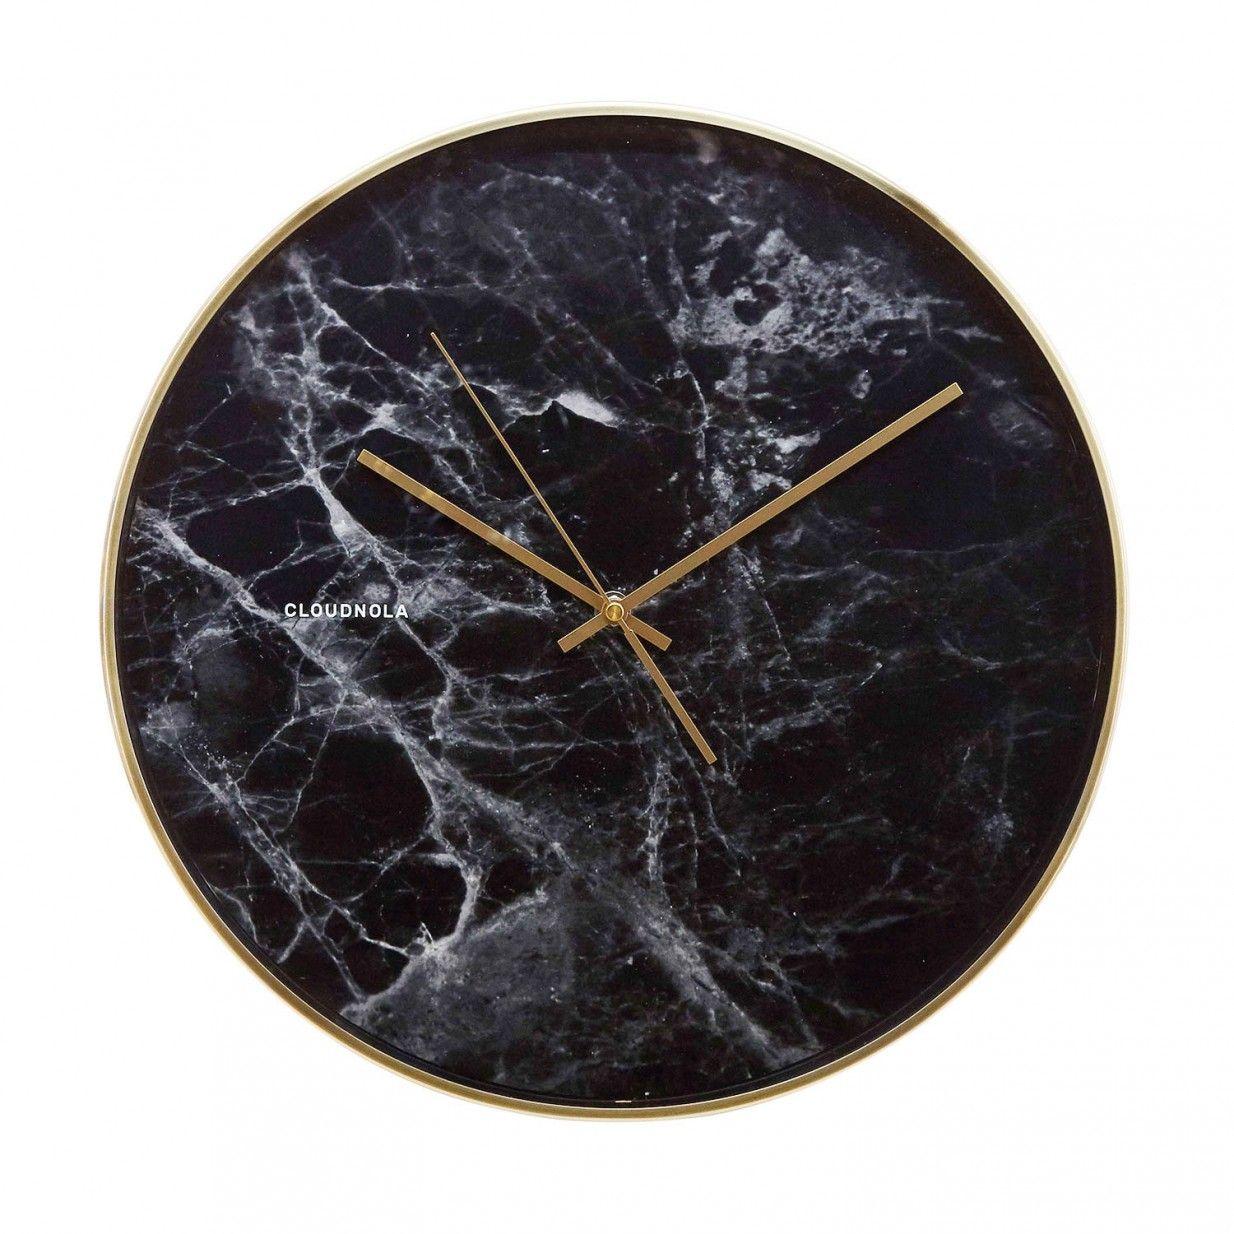 Cloud Hola Marble Clock Monoqi 43 Http Monoqi Co Uk Gb En Flash Sale All That Wall Clock Marble Clock Clock